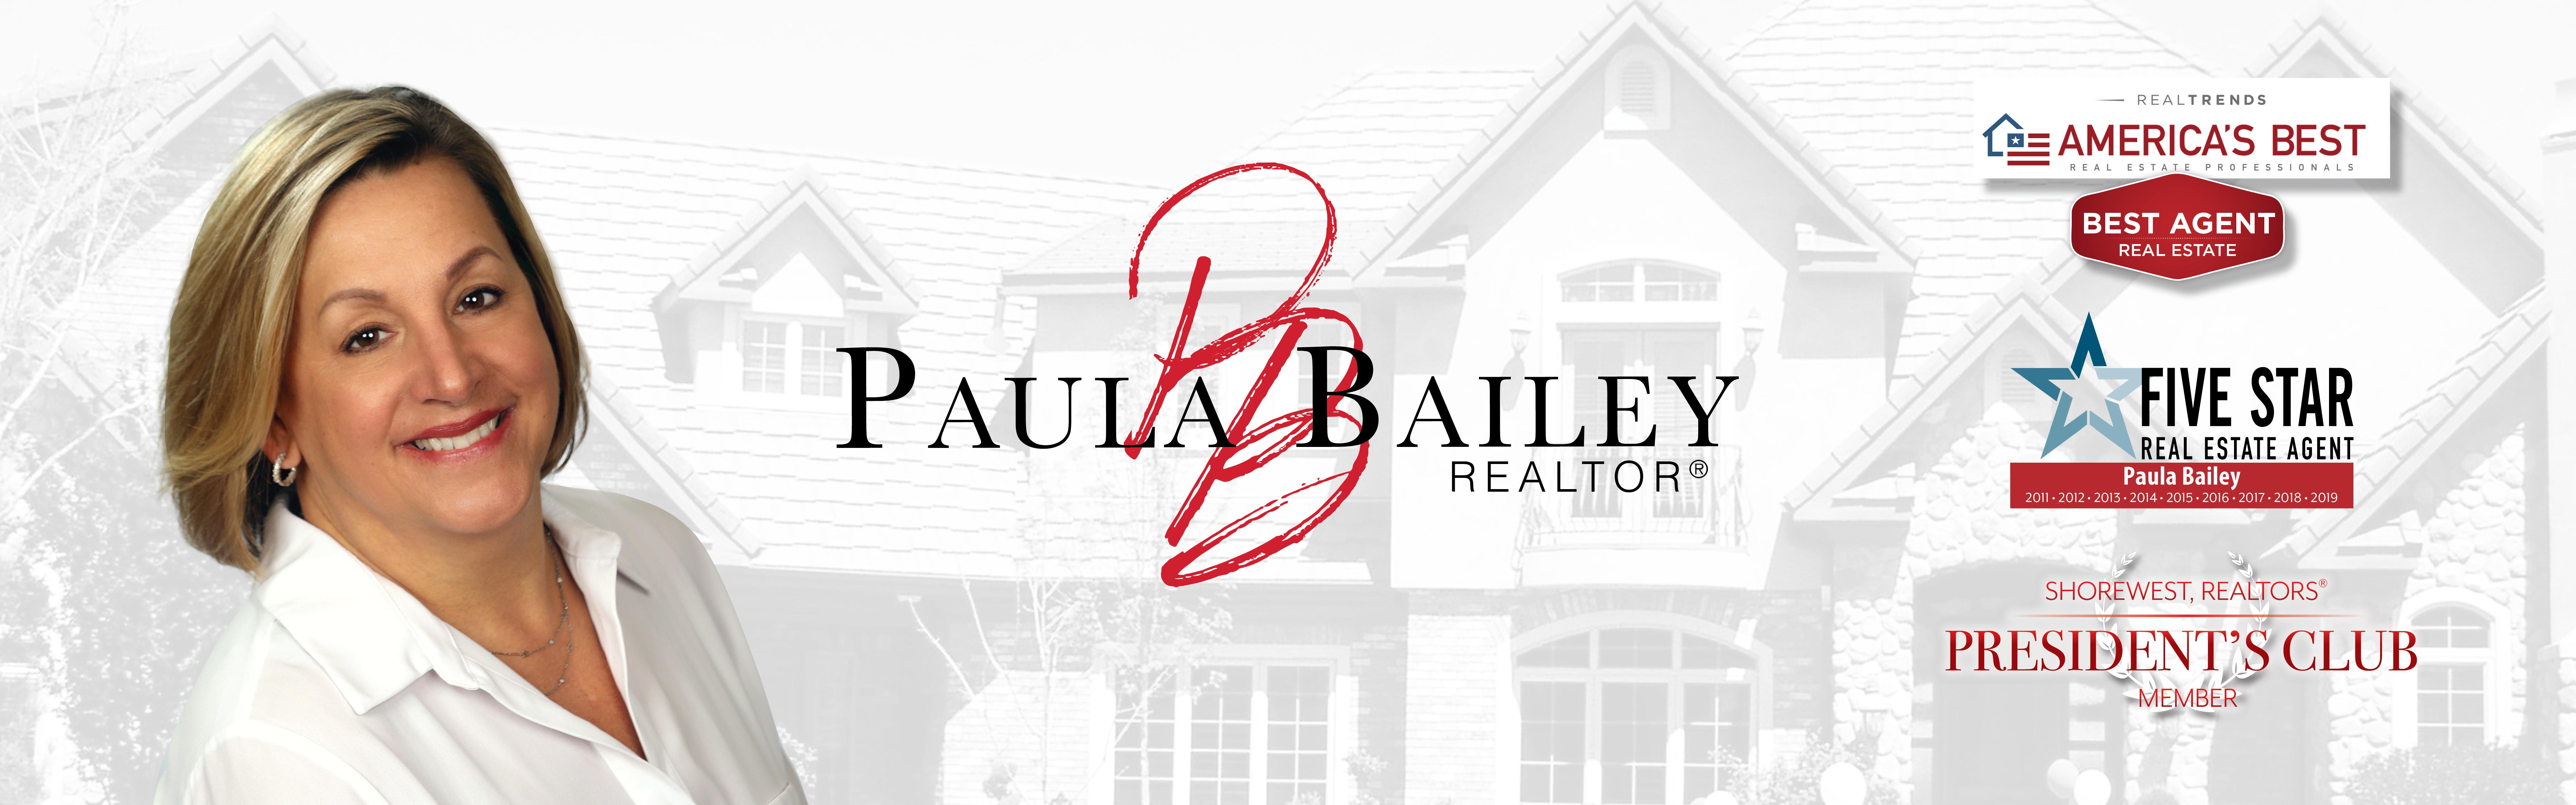 Paula Bailey